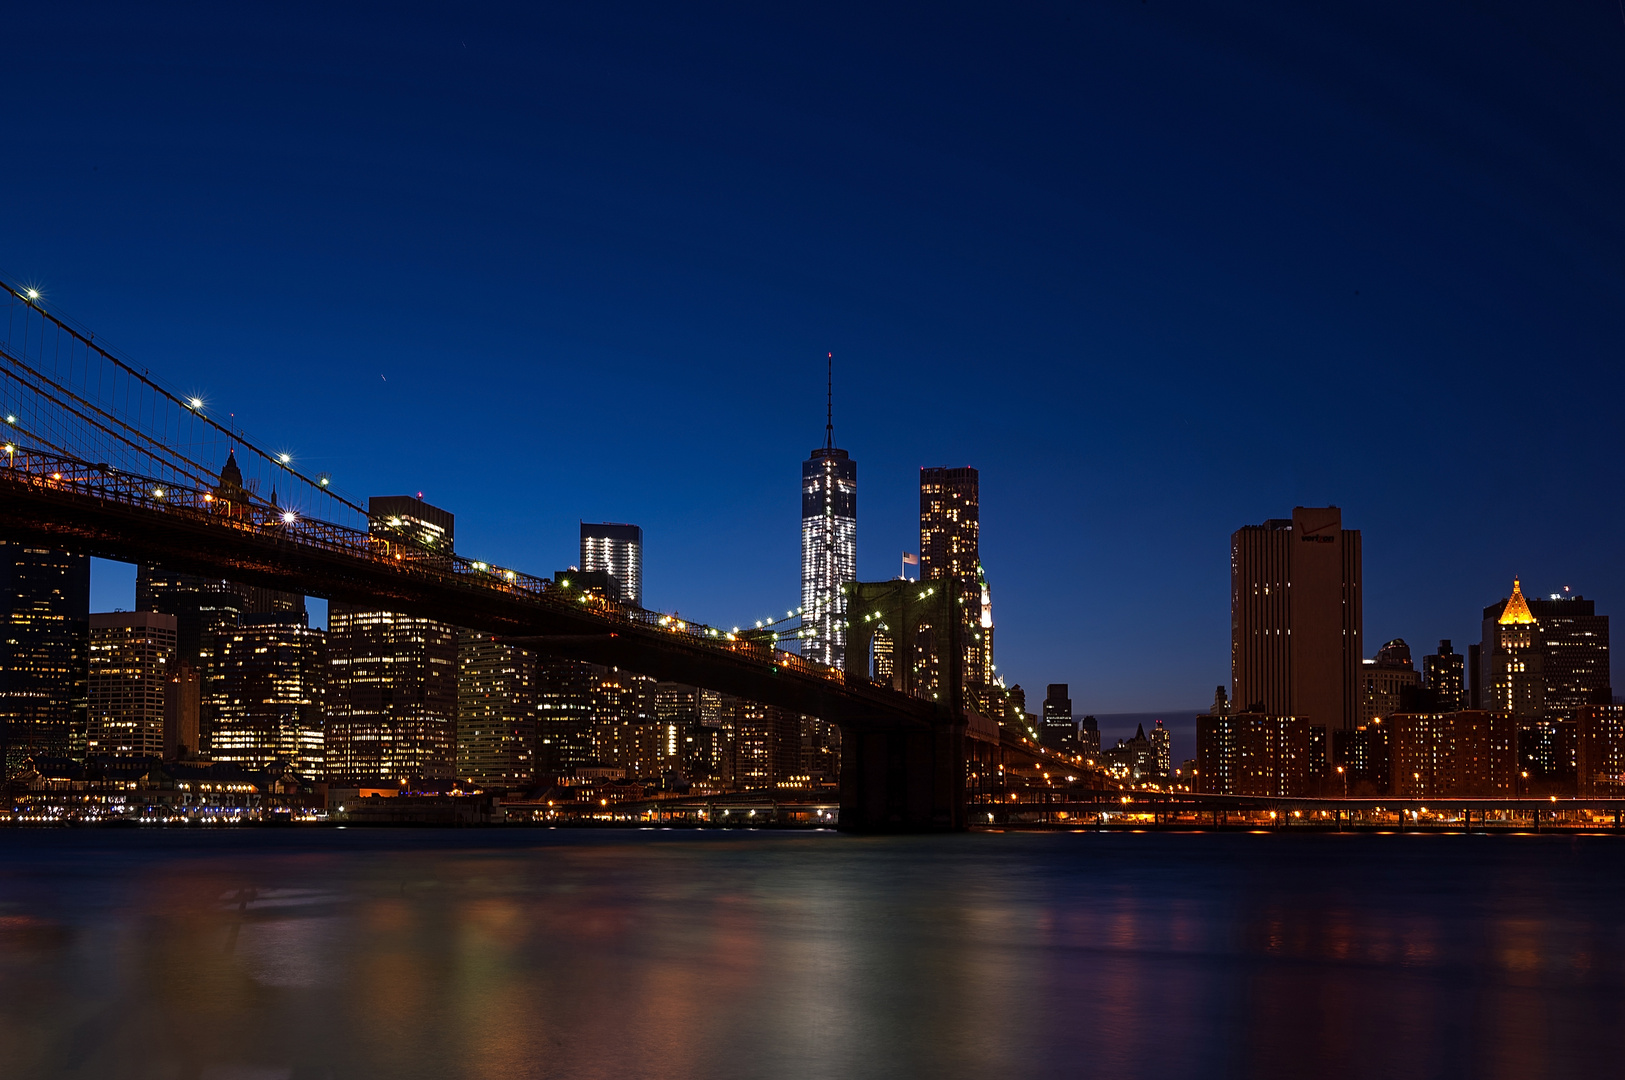 New York City Lights 2